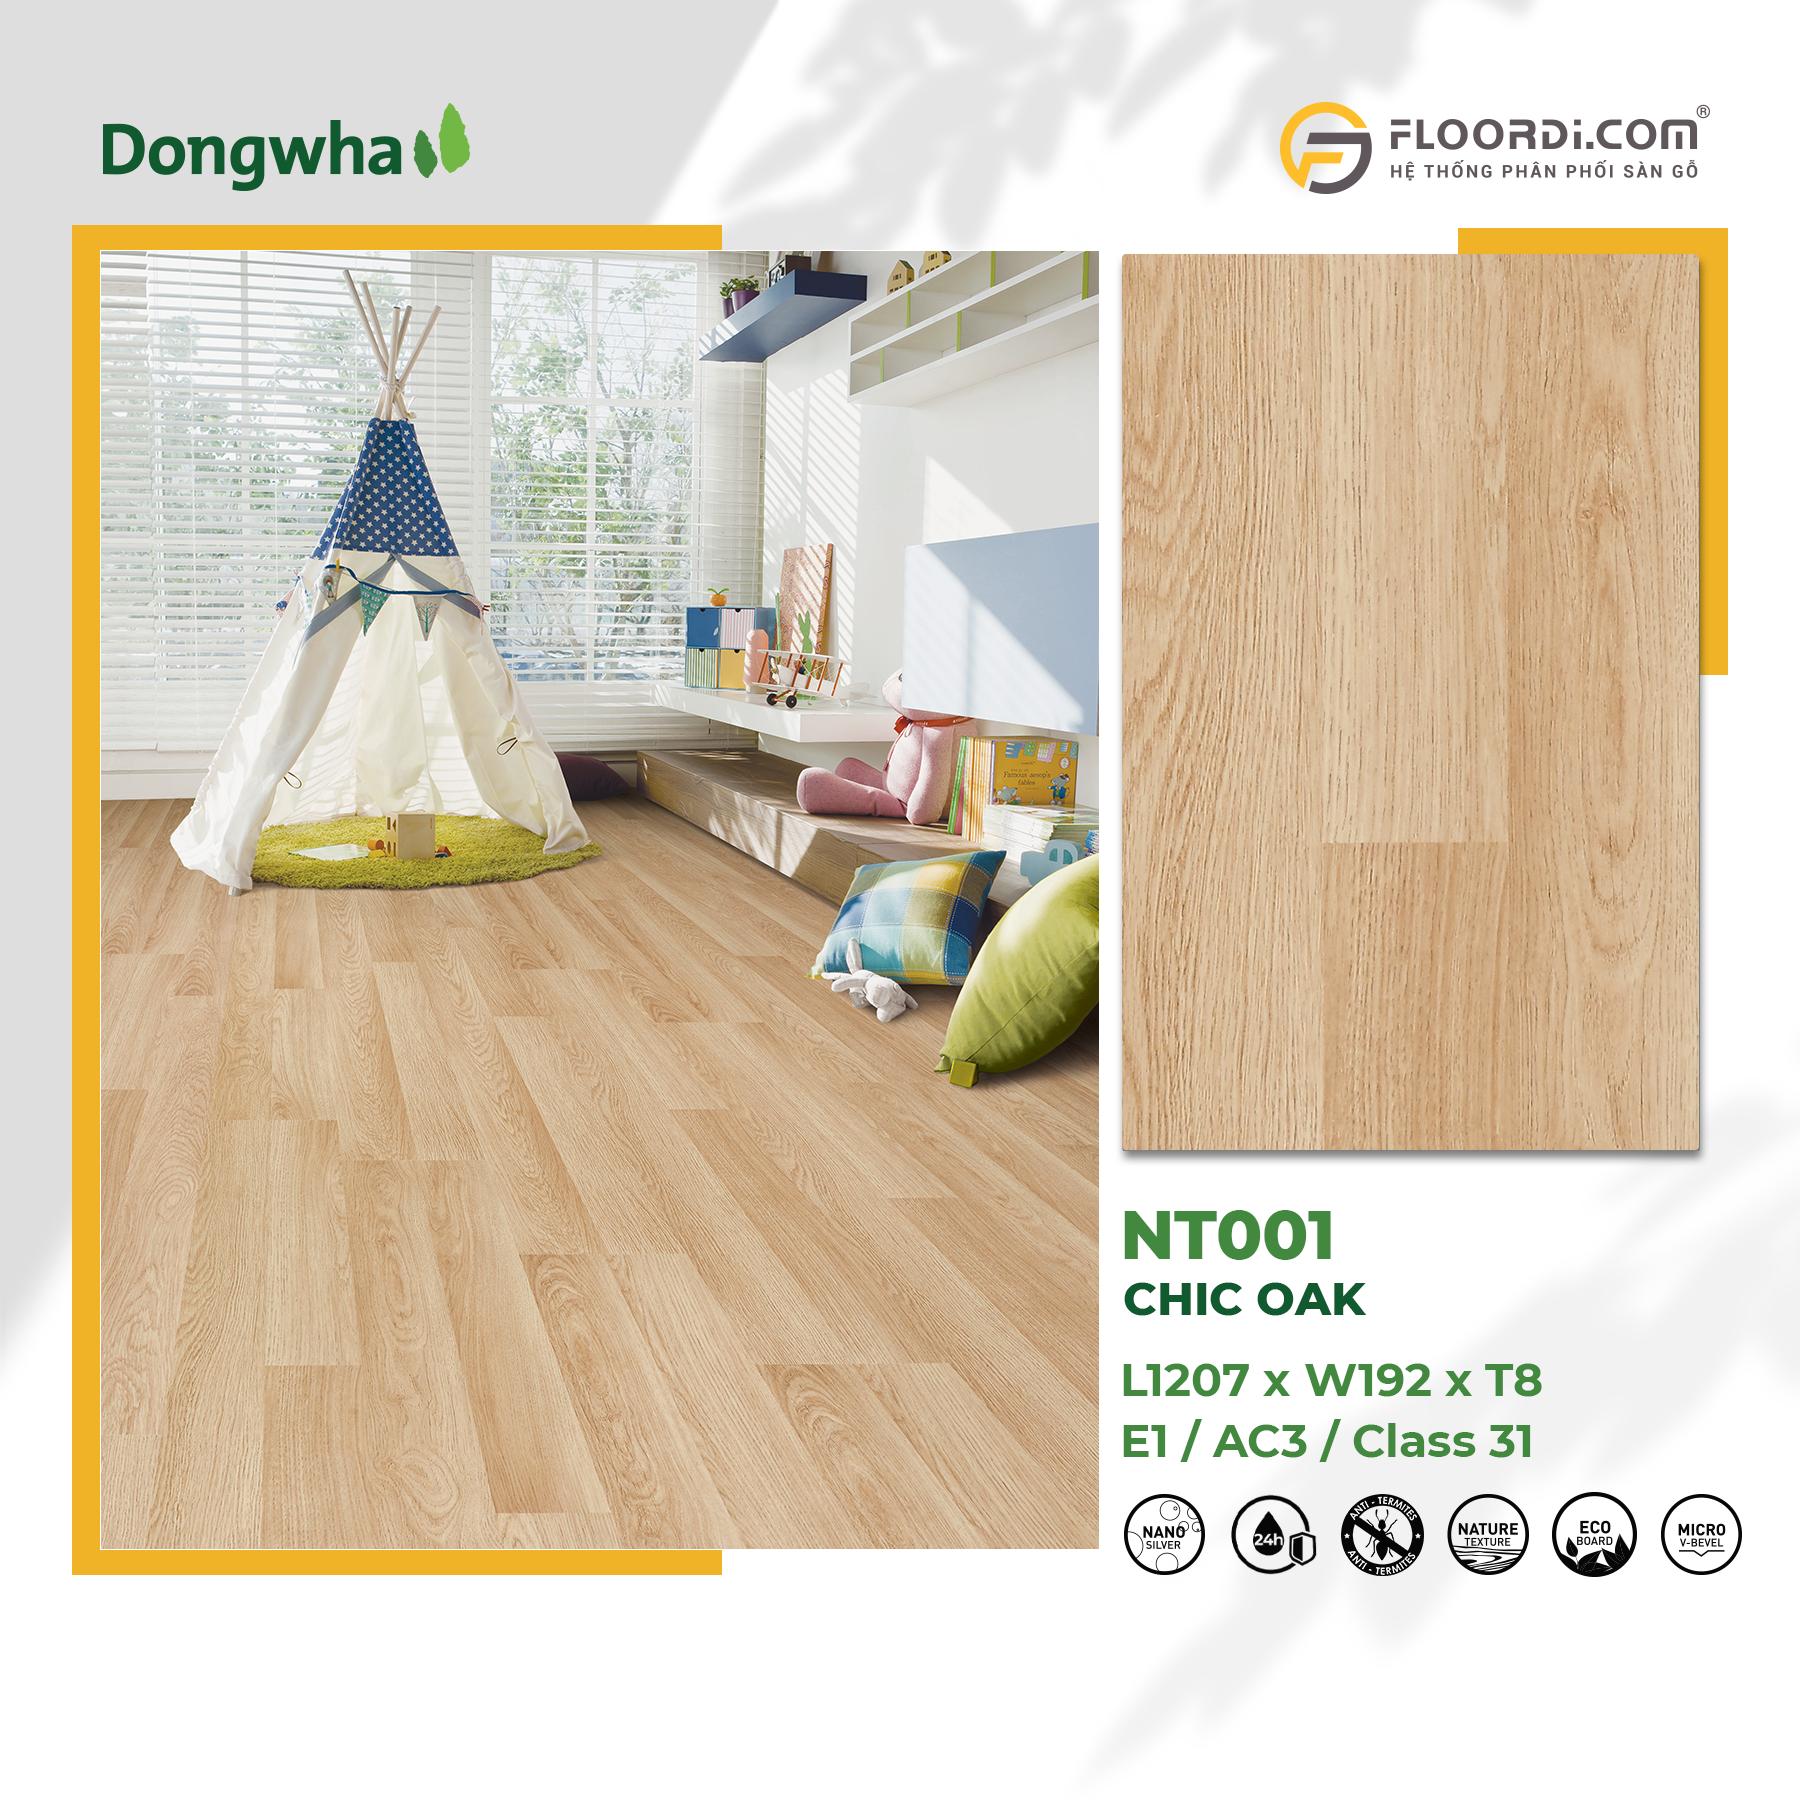 Album Dongwha 1800x1800 NT001 Chic Oak 052021